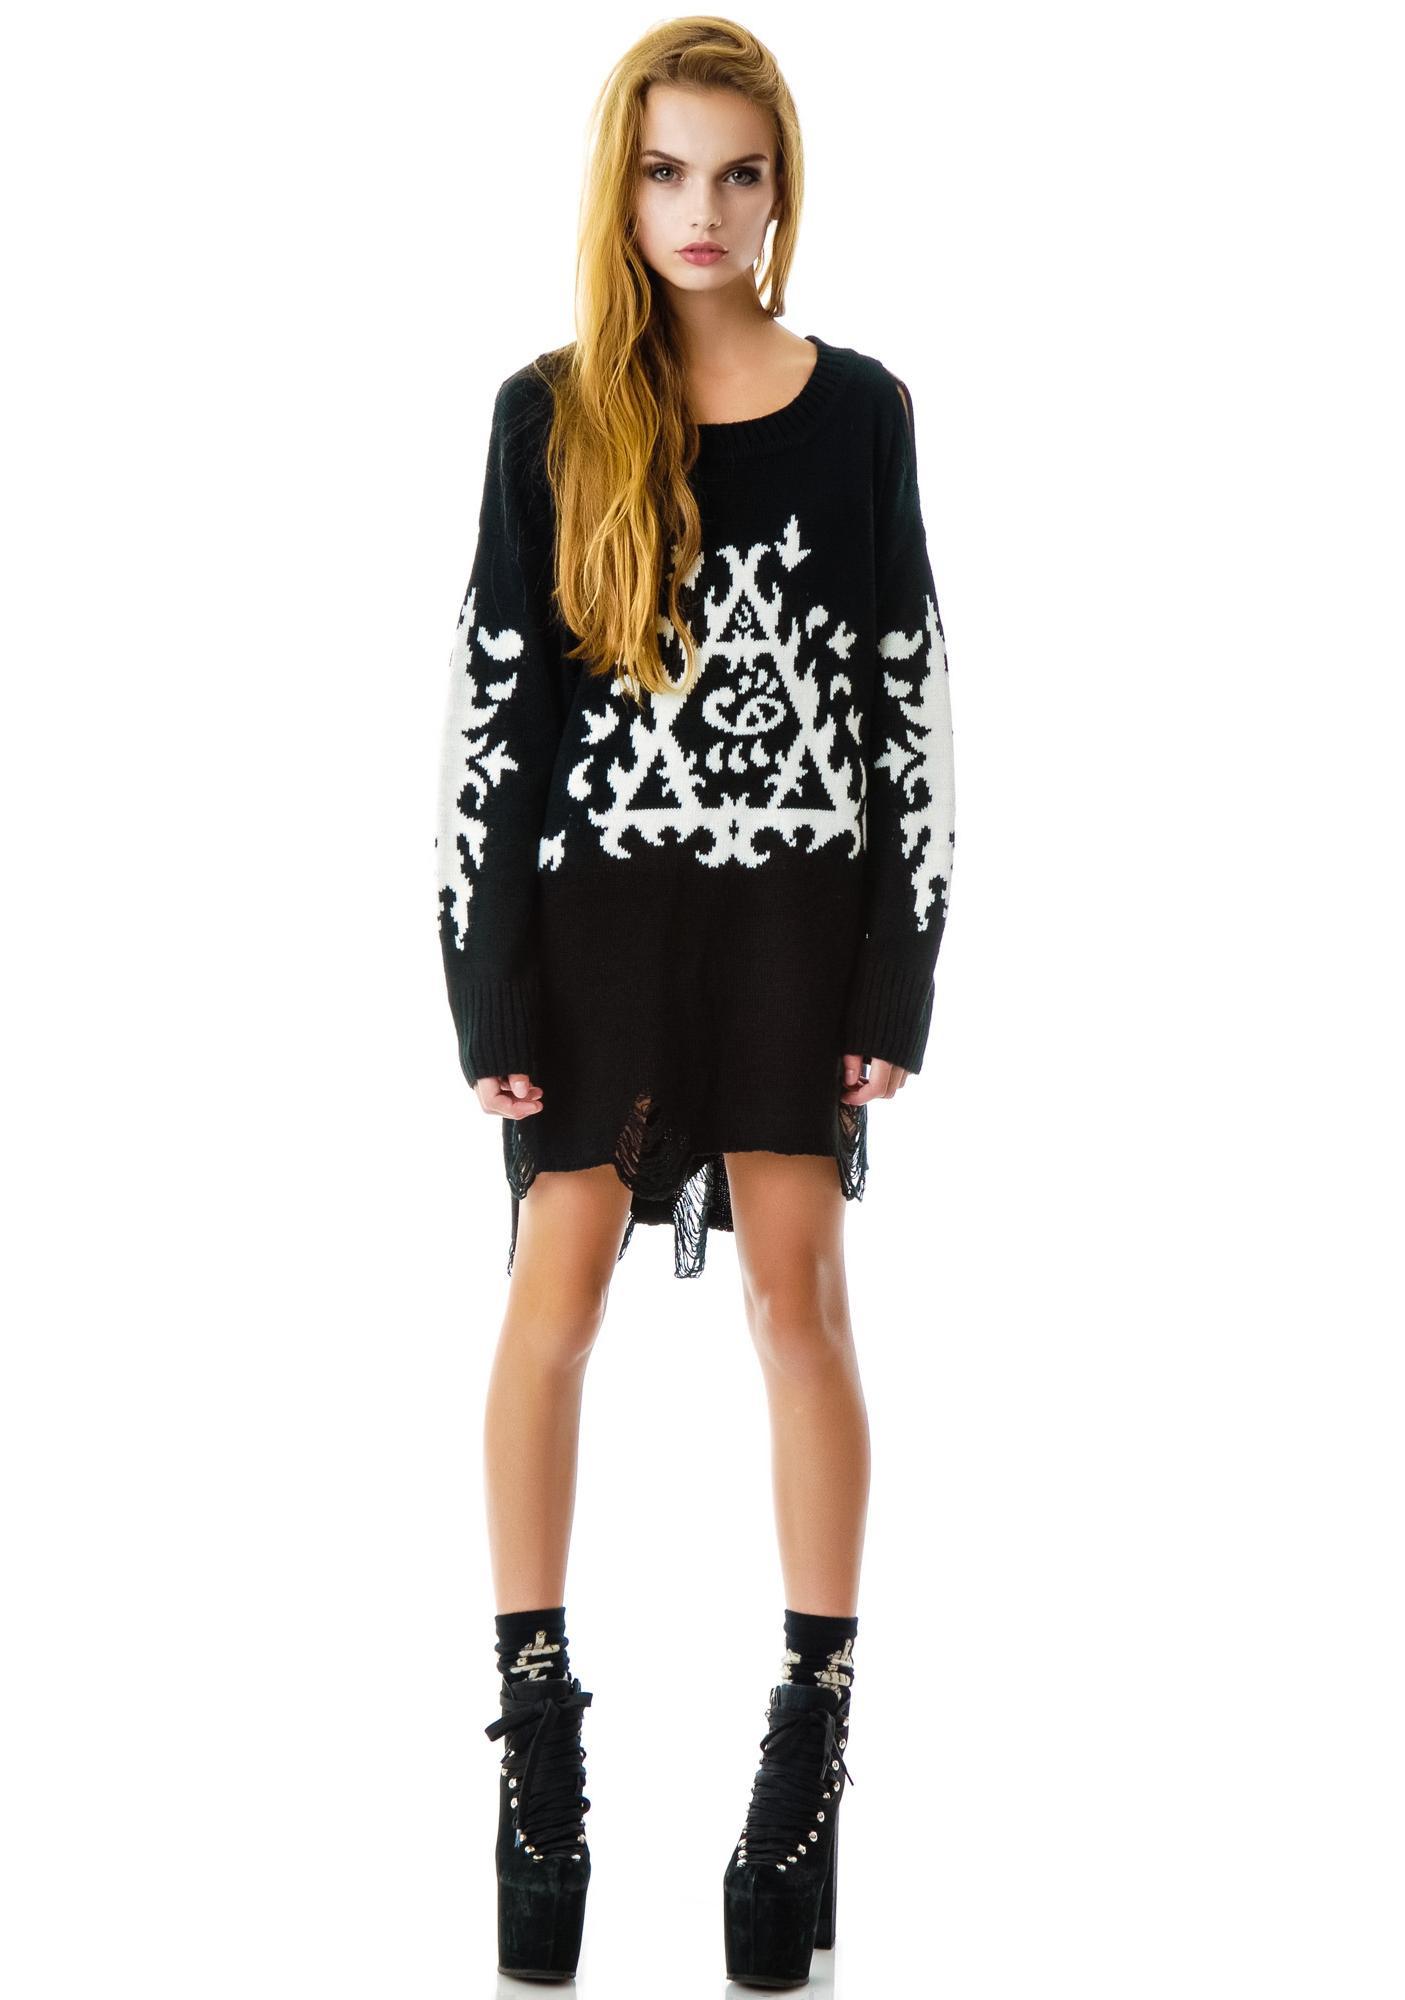 UNIF Ornate Sweater